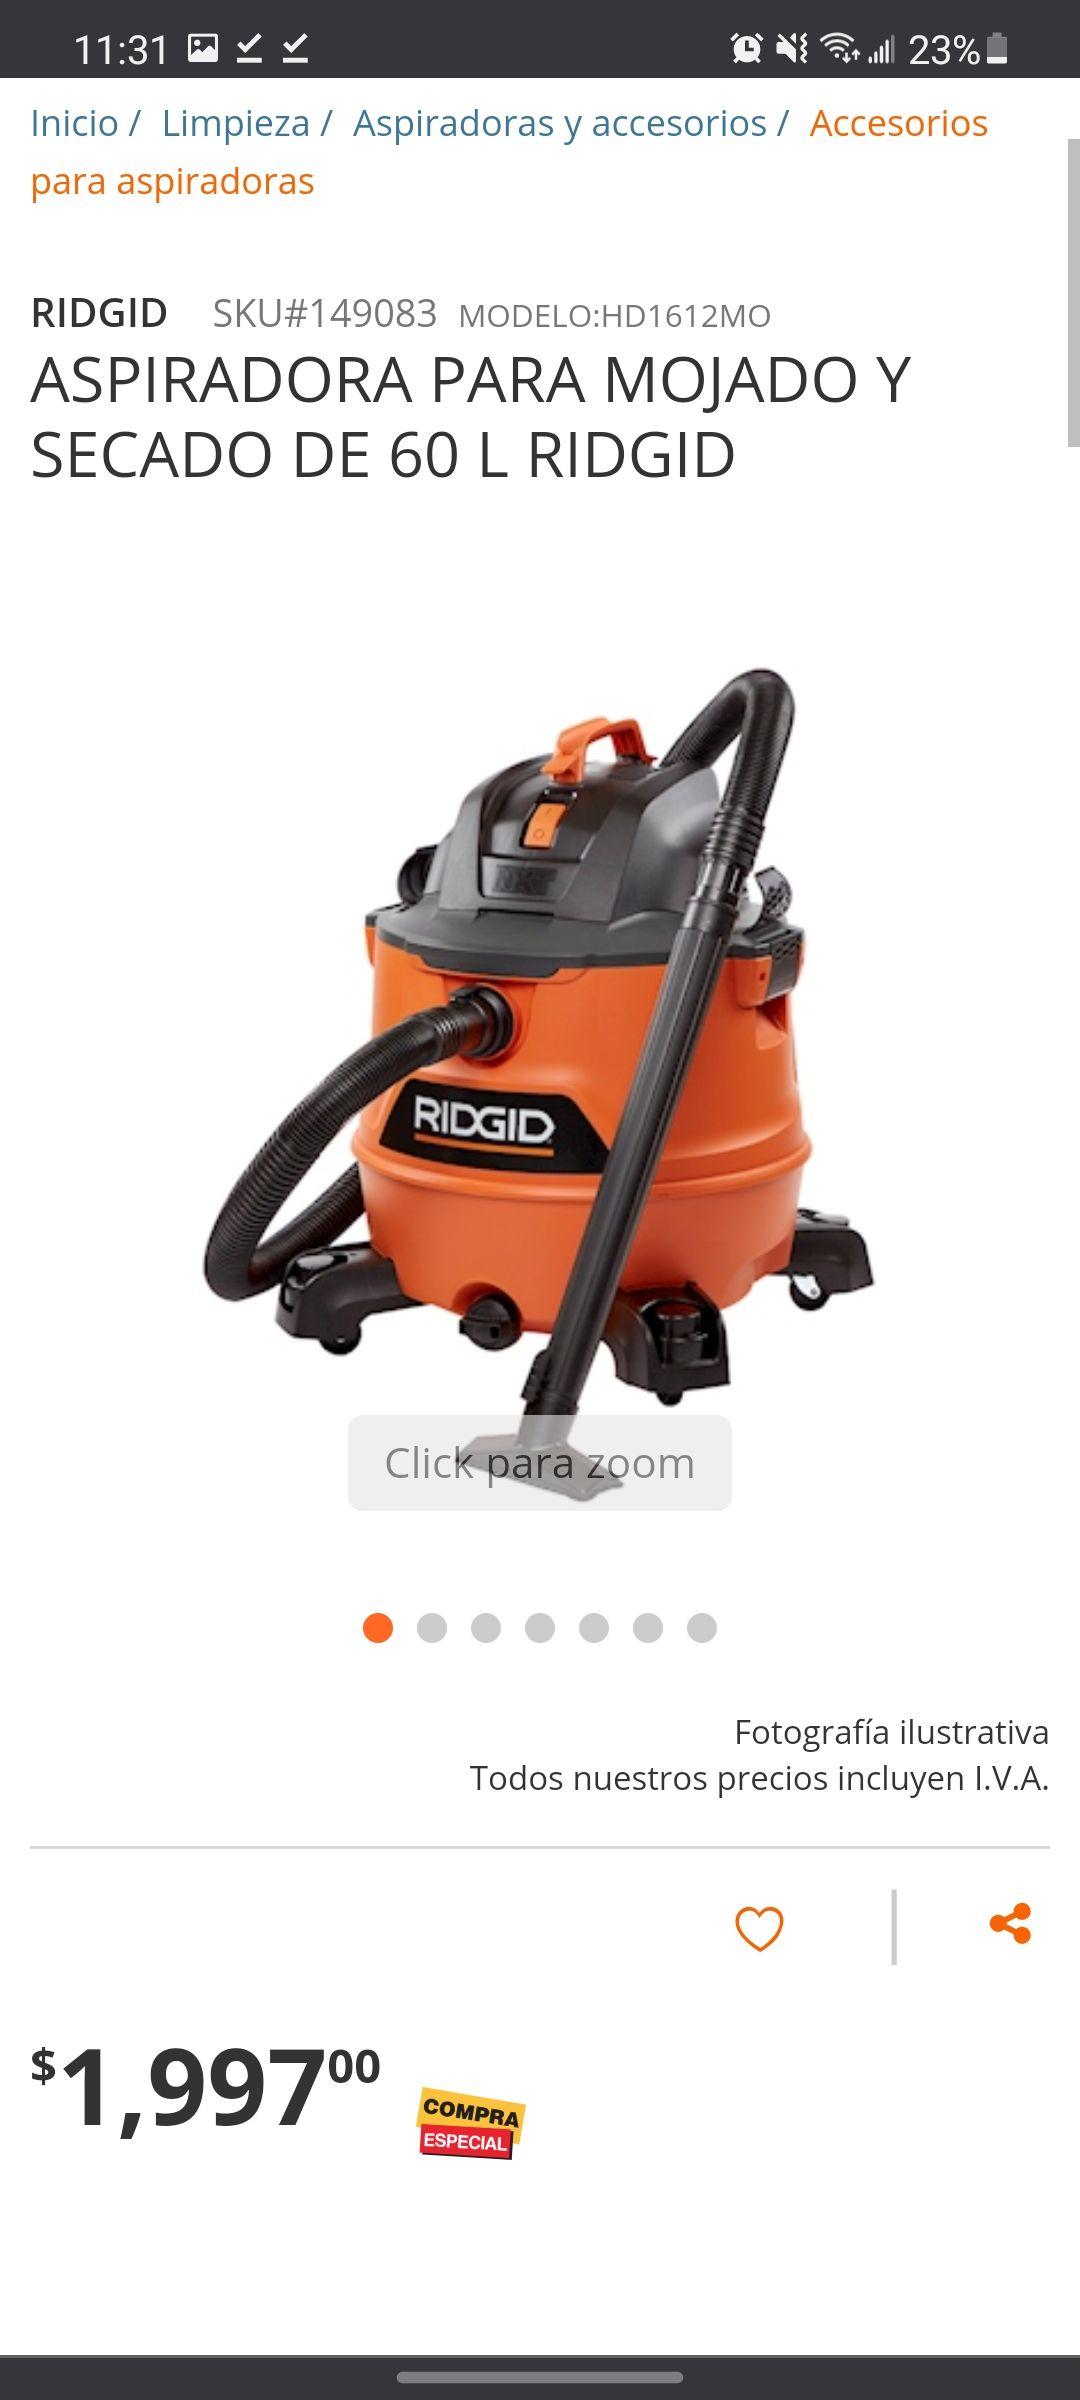 Home Depot: Aspiradora ridgid 60L 5 hp seco y mojado